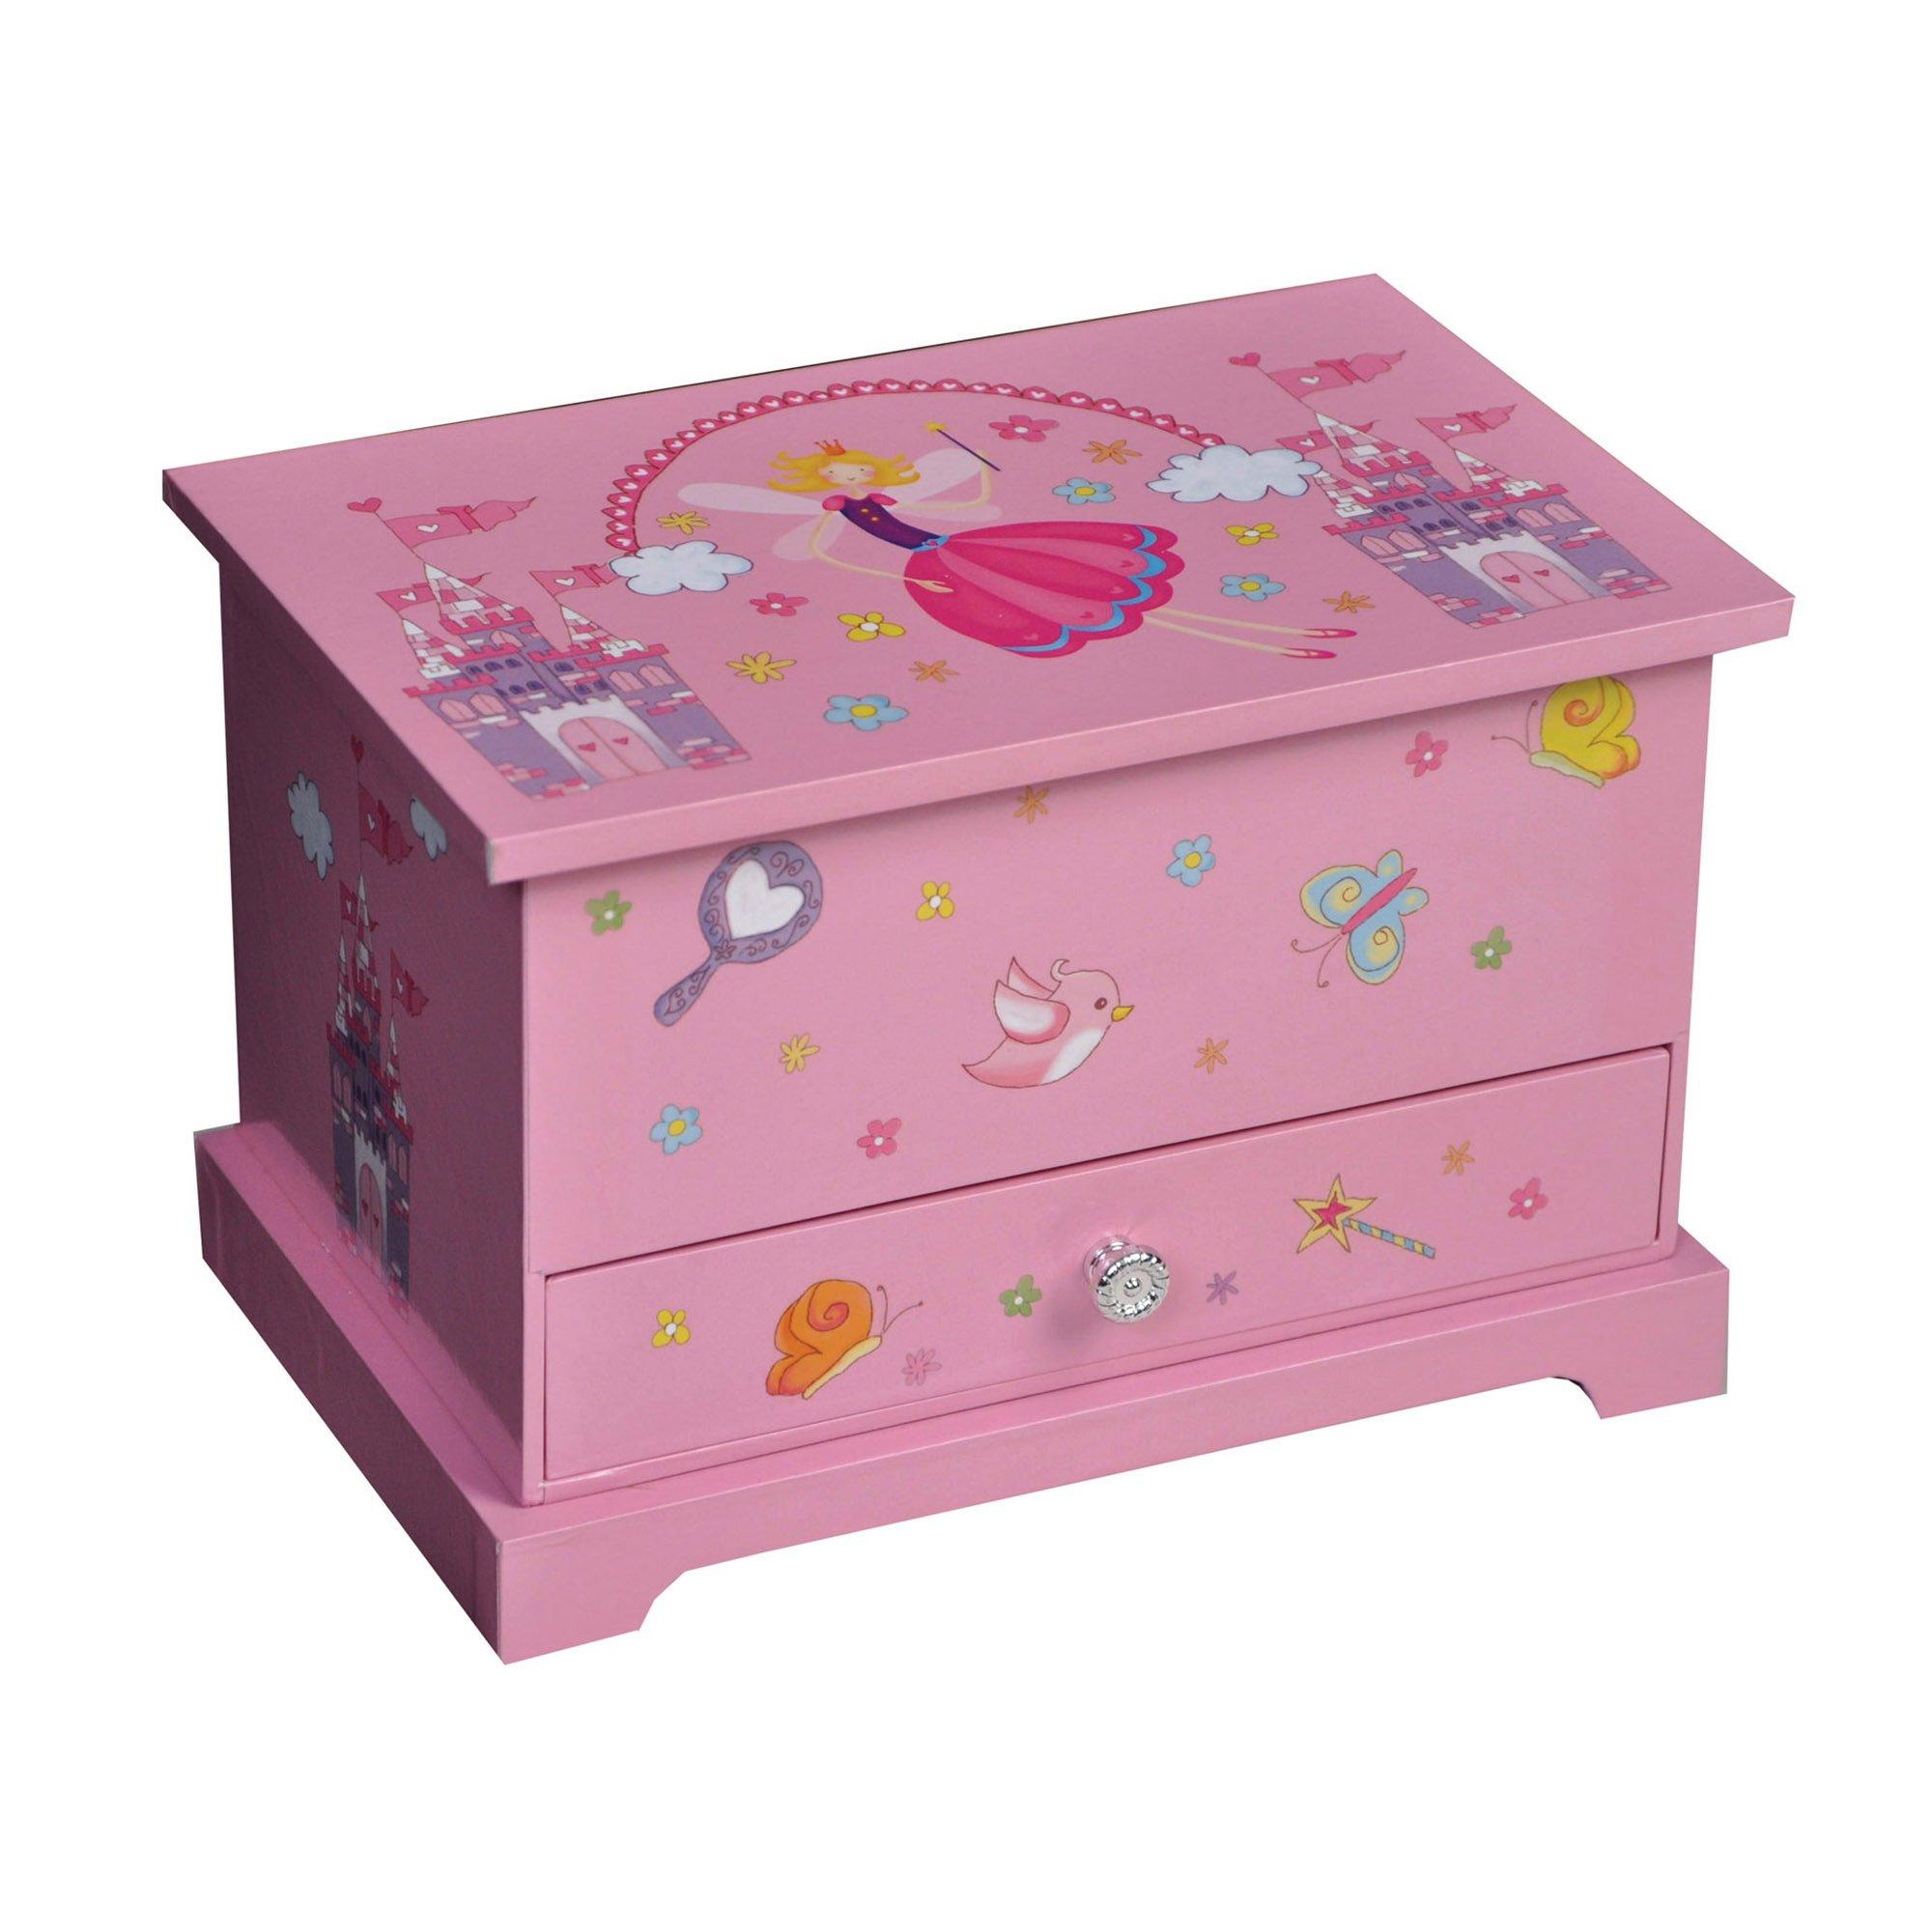 Mele & Co. Kerri Girl's Musical Ballerina Jewelry Box (Castles/Fairy Princess)